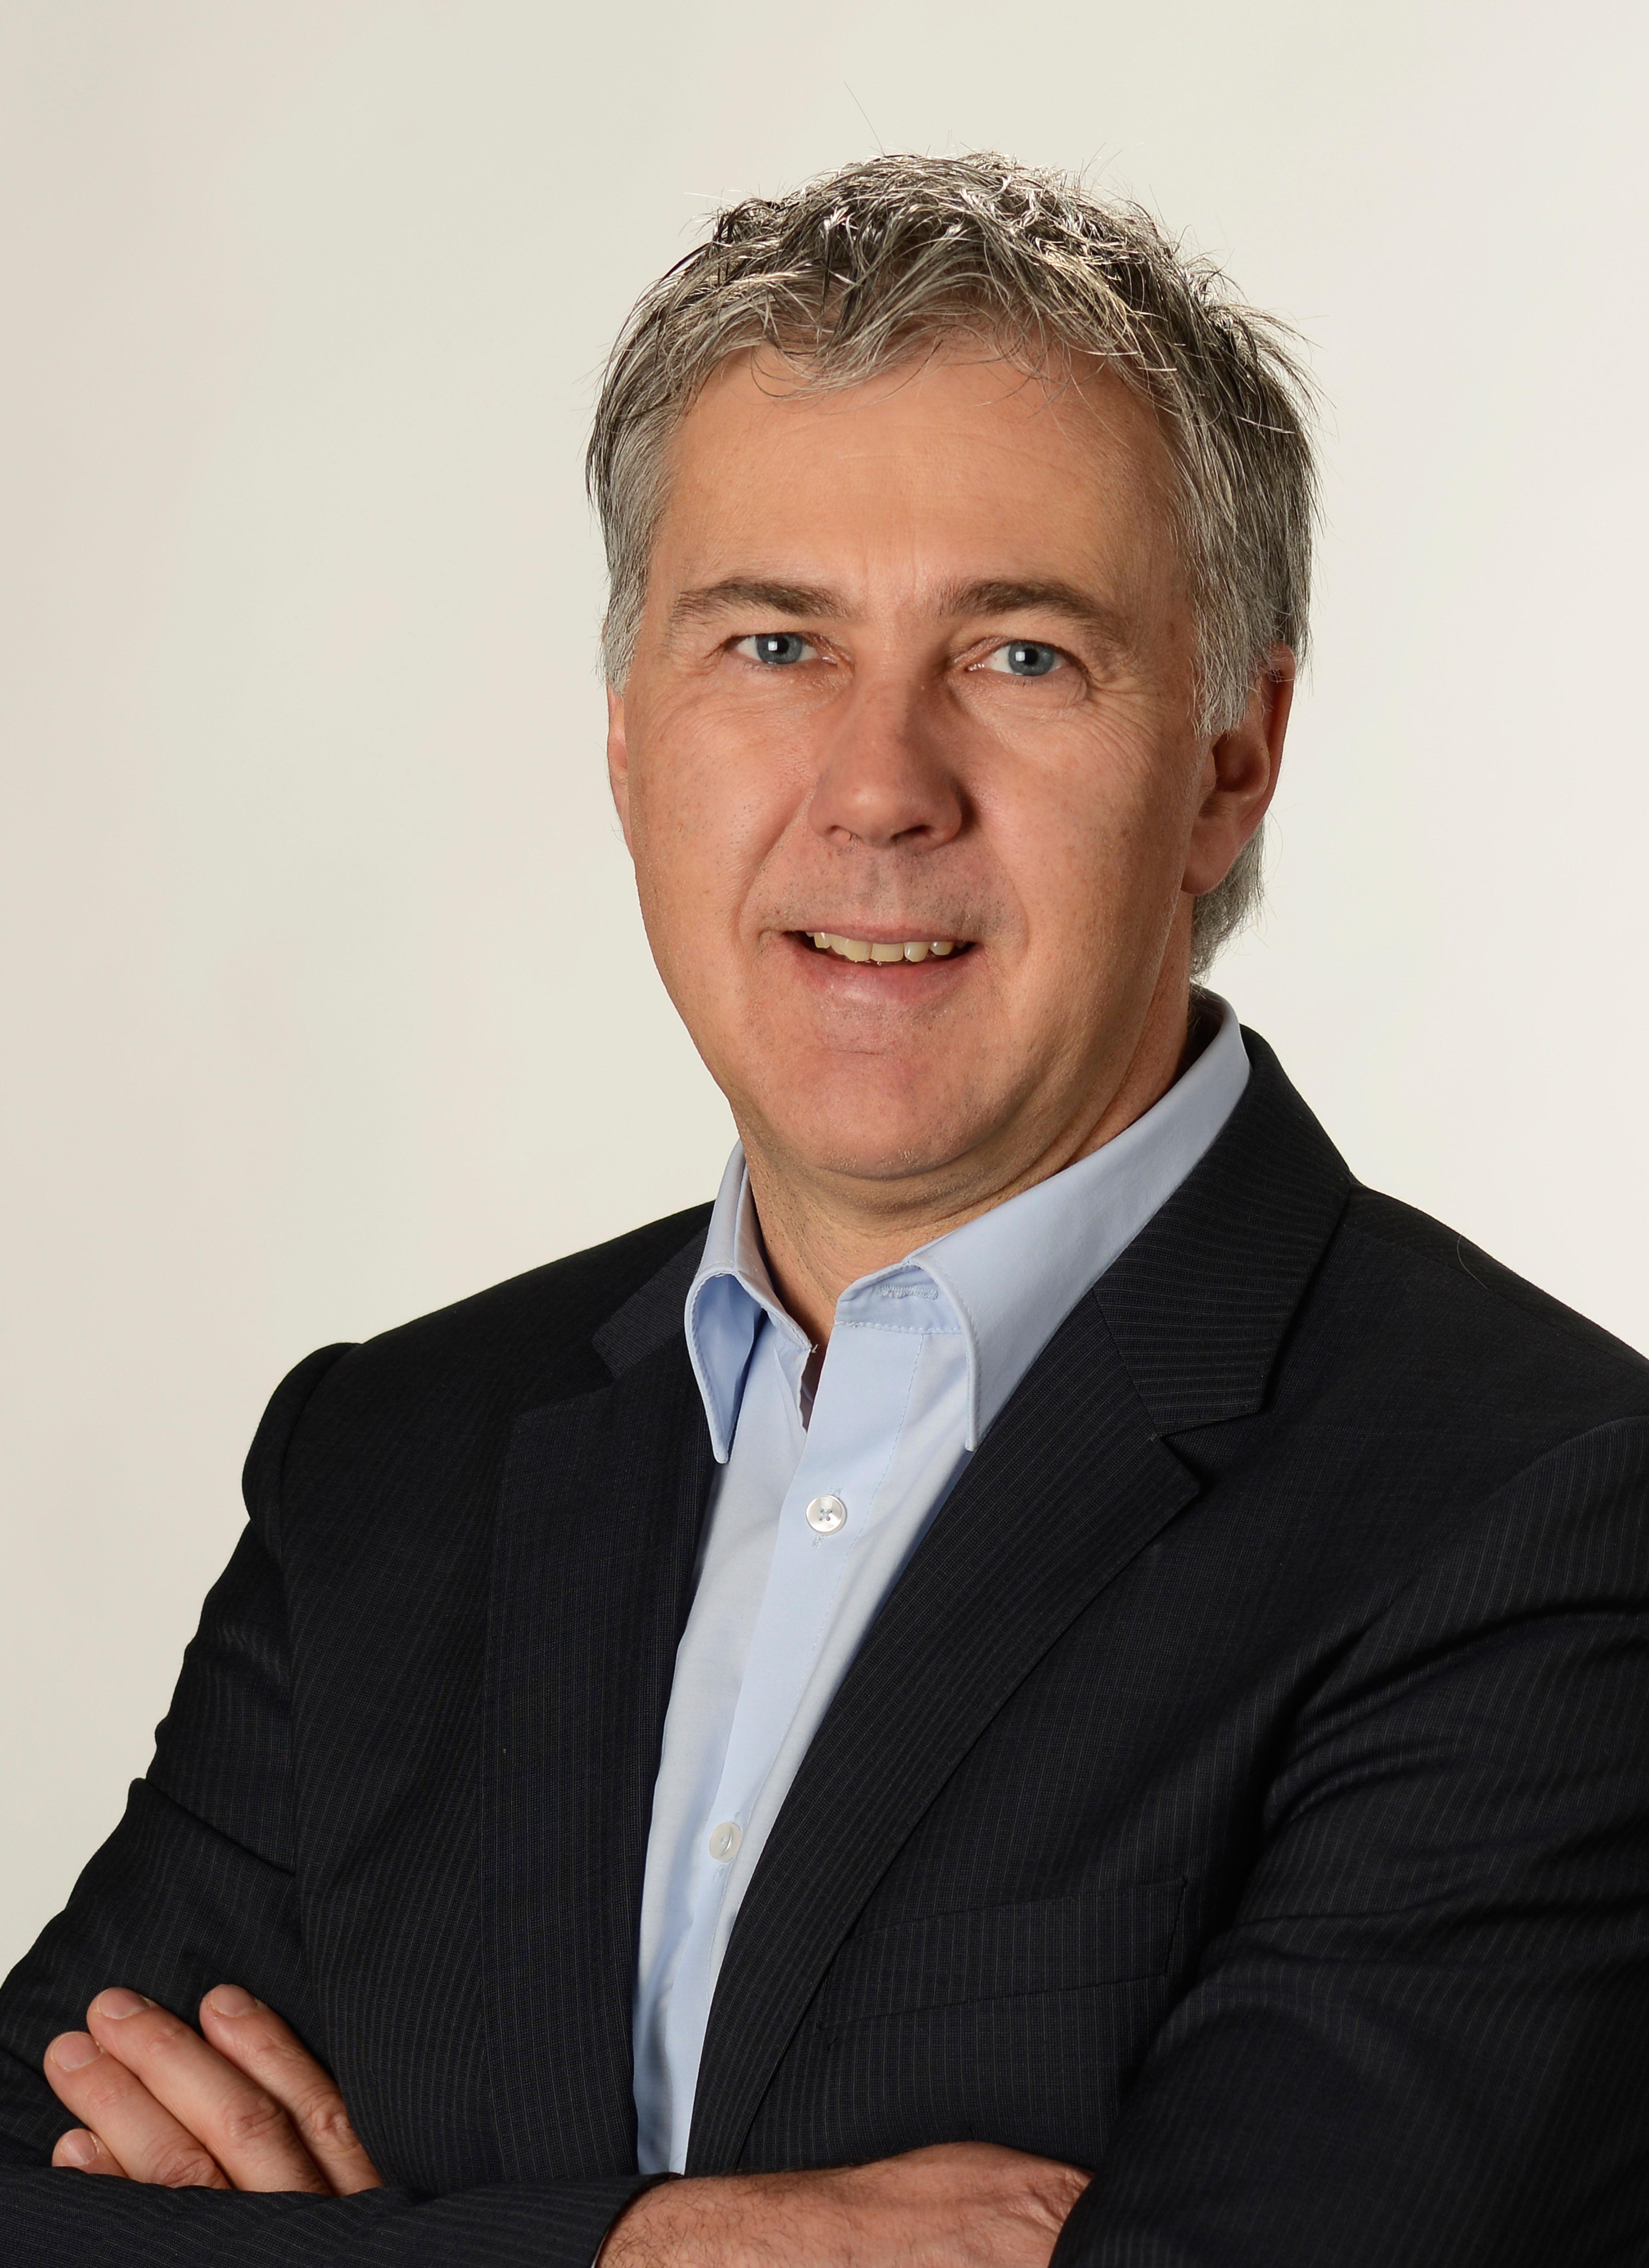 Reinhard Markus